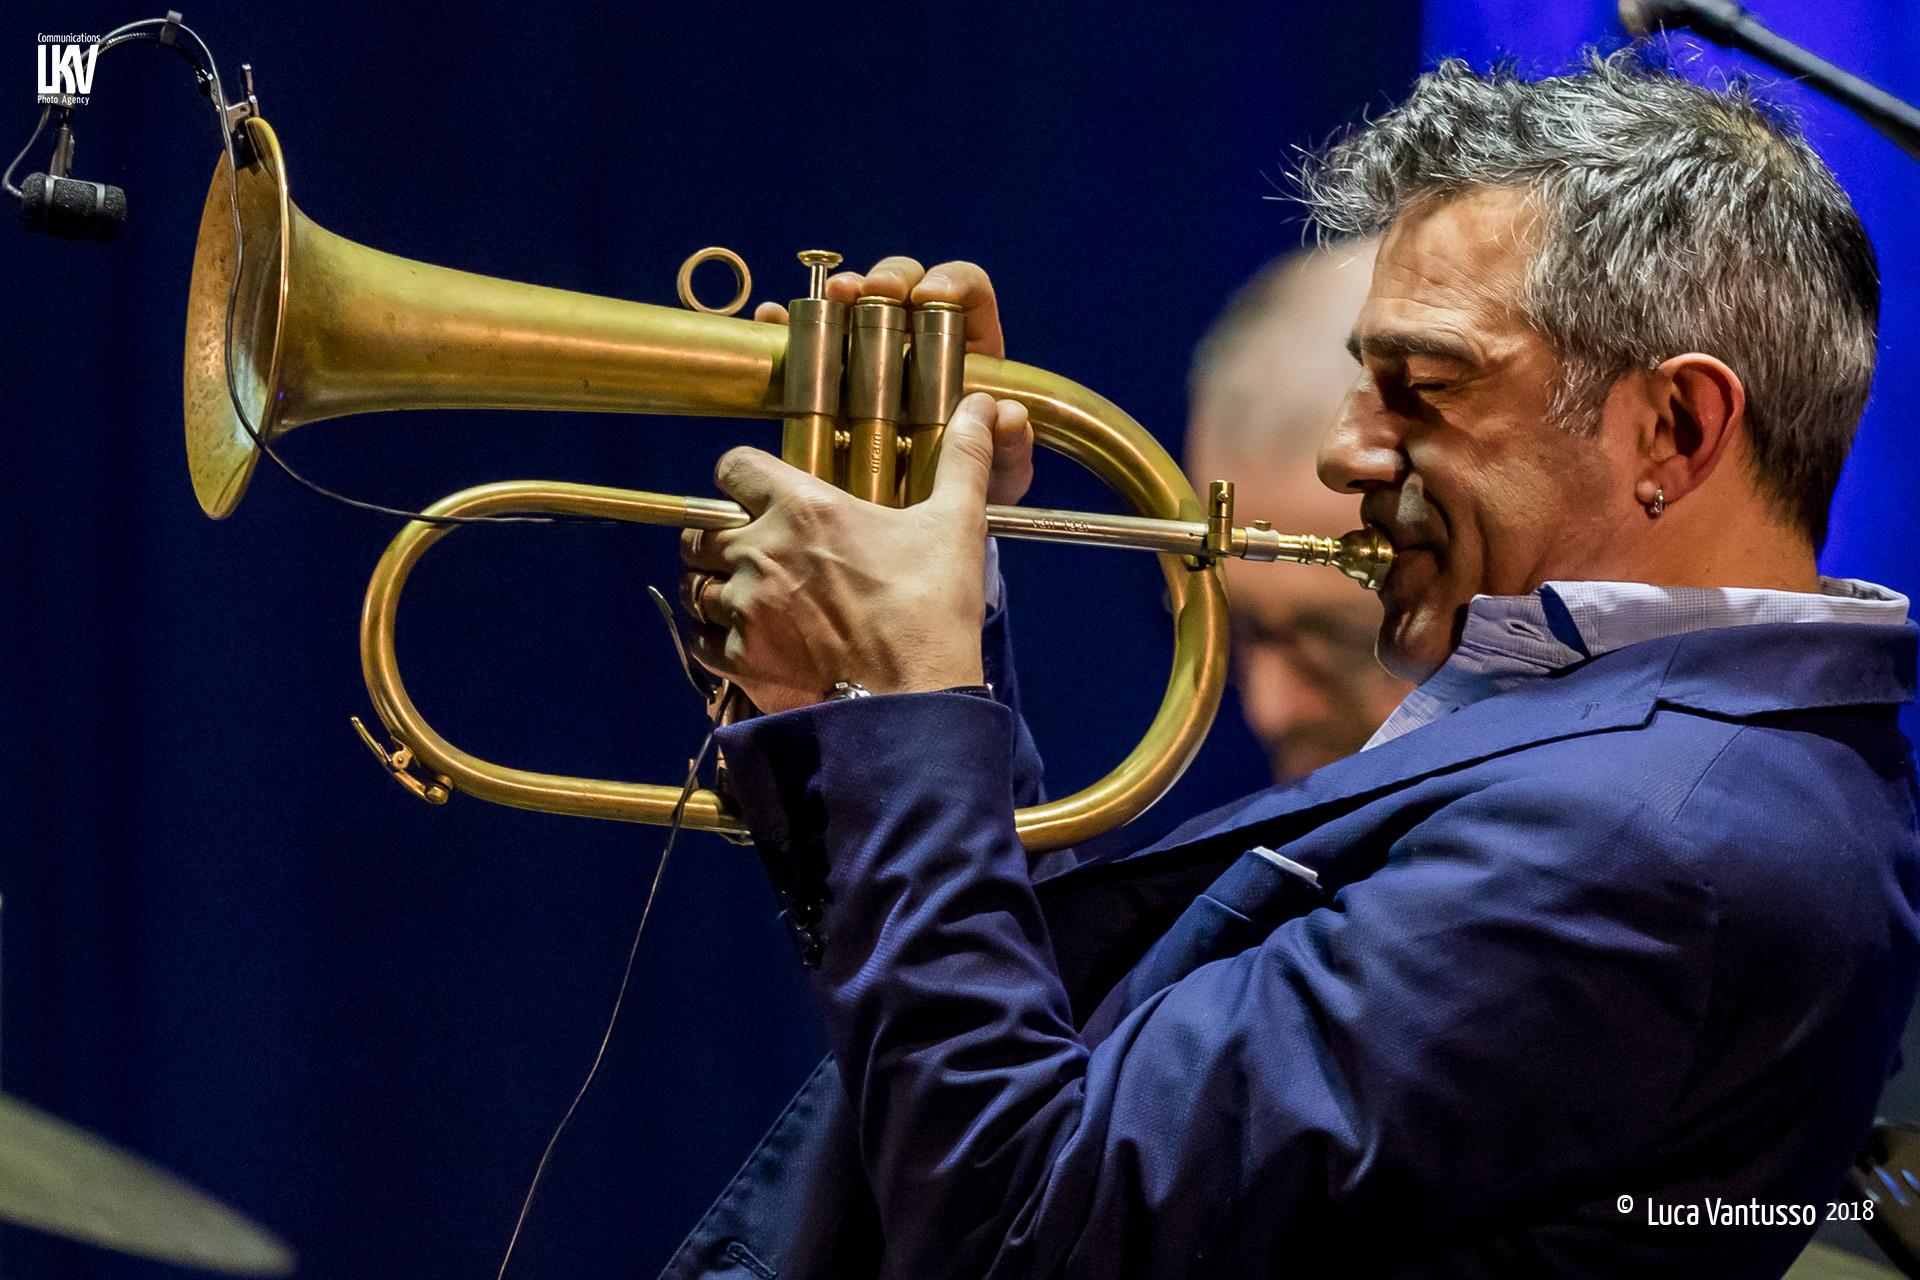 Angela Bartolo e Luca Vantusso</br>Devil Quartet al Bollate Jazz Meeting</br>Reportage